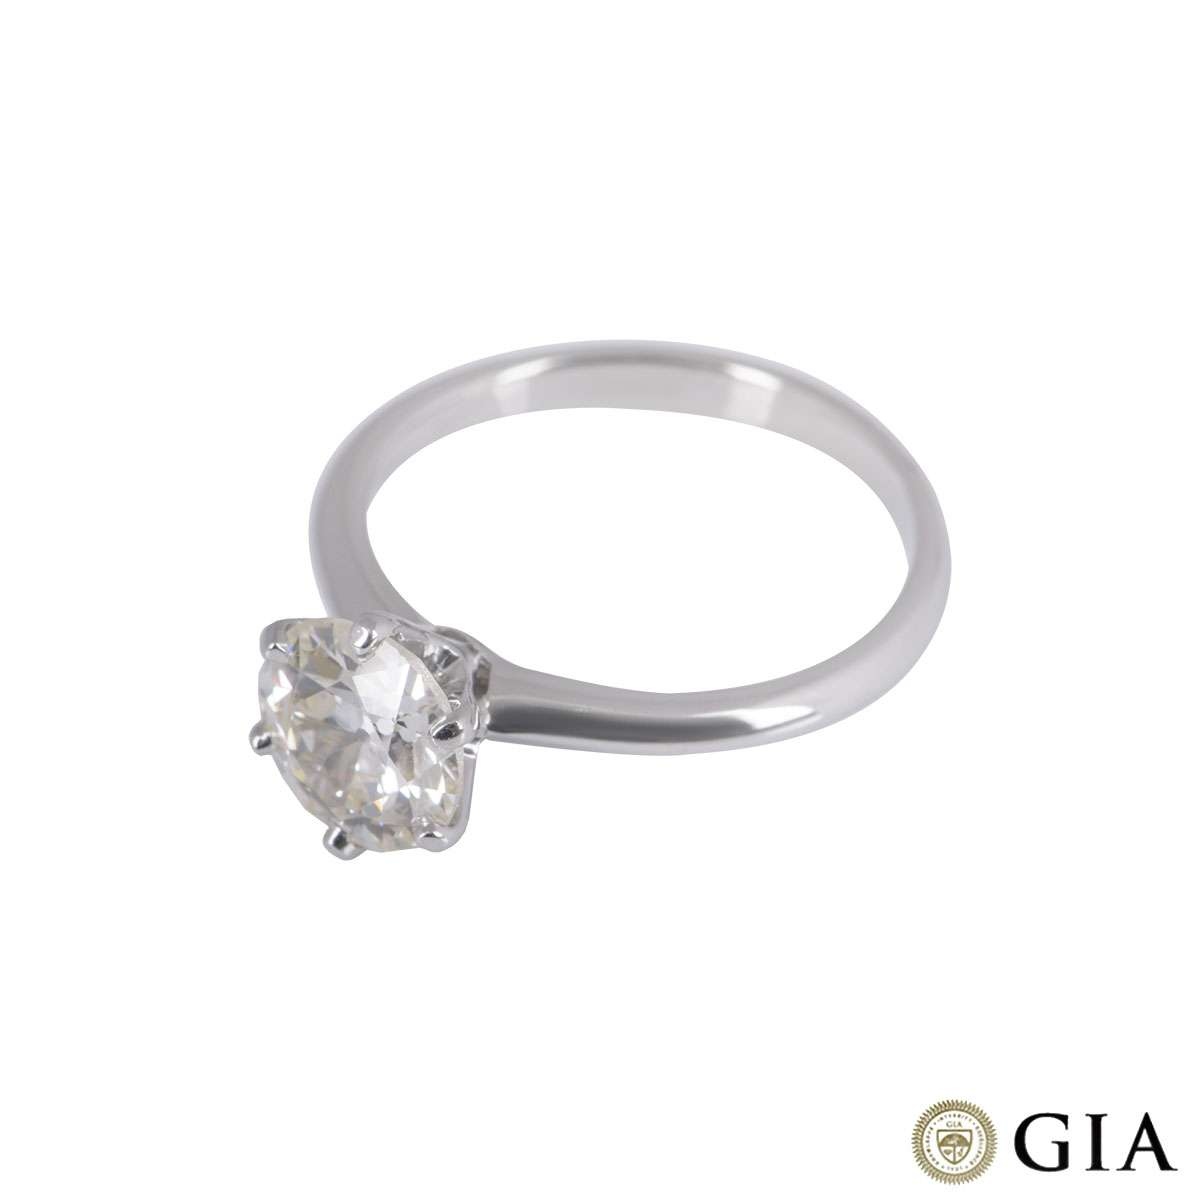 White Gold Old European Cut Diamond Ring 1.61ct M/VS2